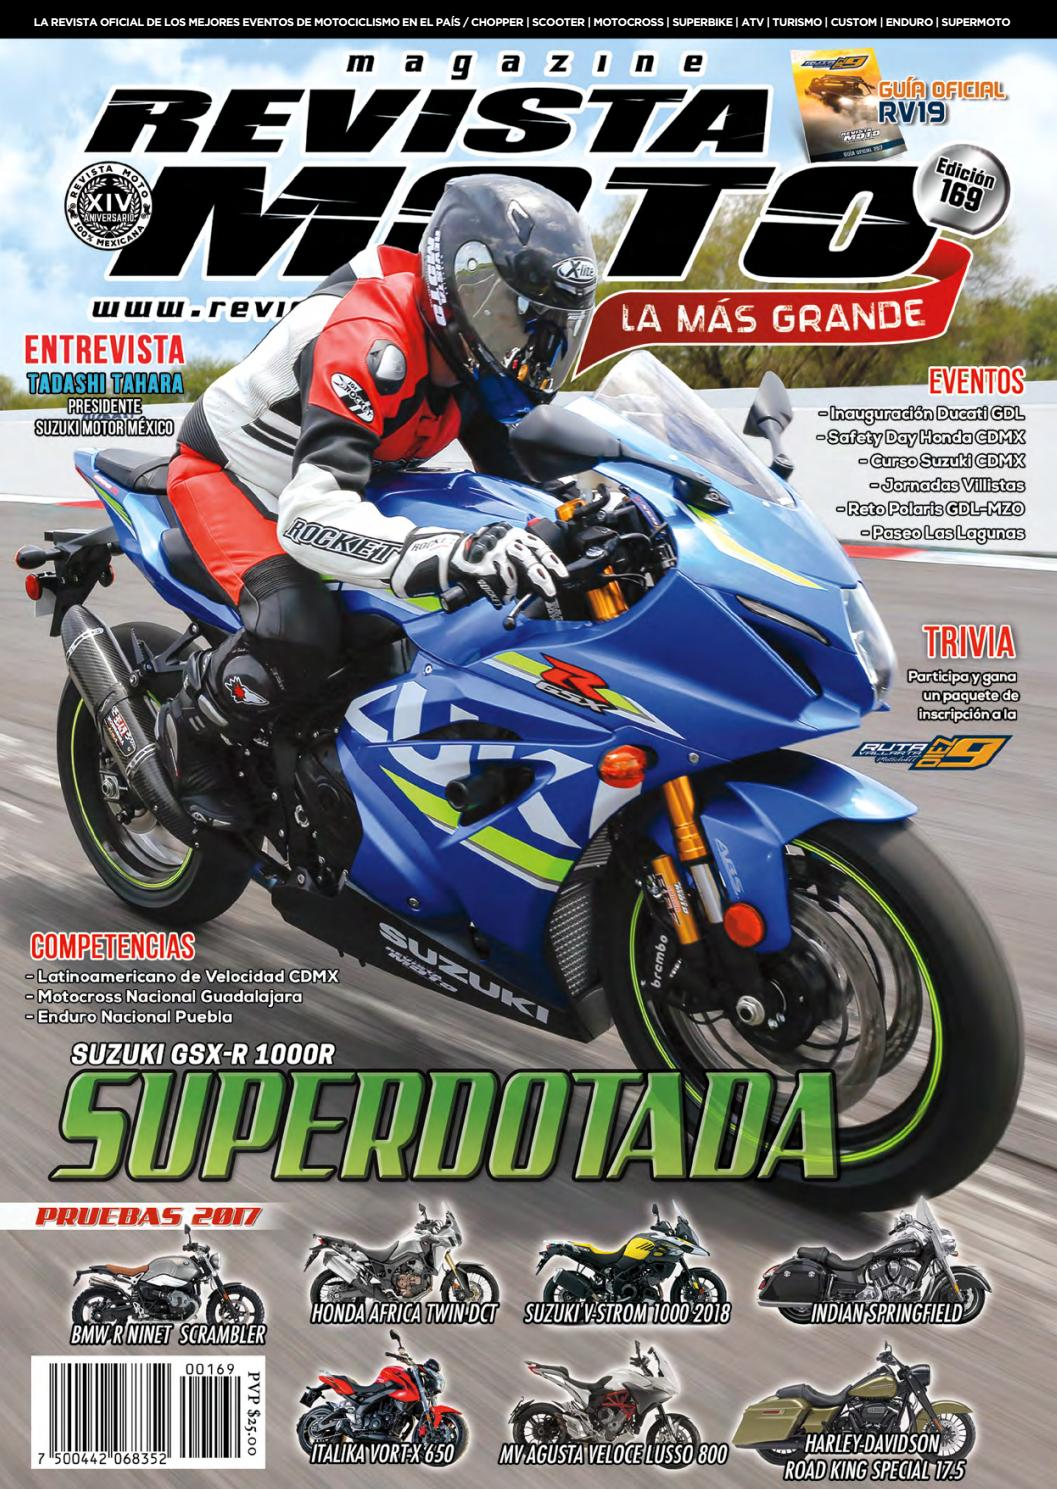 motocross motocicleta carreras motocicletas motos de cross motocicletas y todoterrenos. Soporte de elevaci/ón ajustable de acero de 330 lb para motocicleta